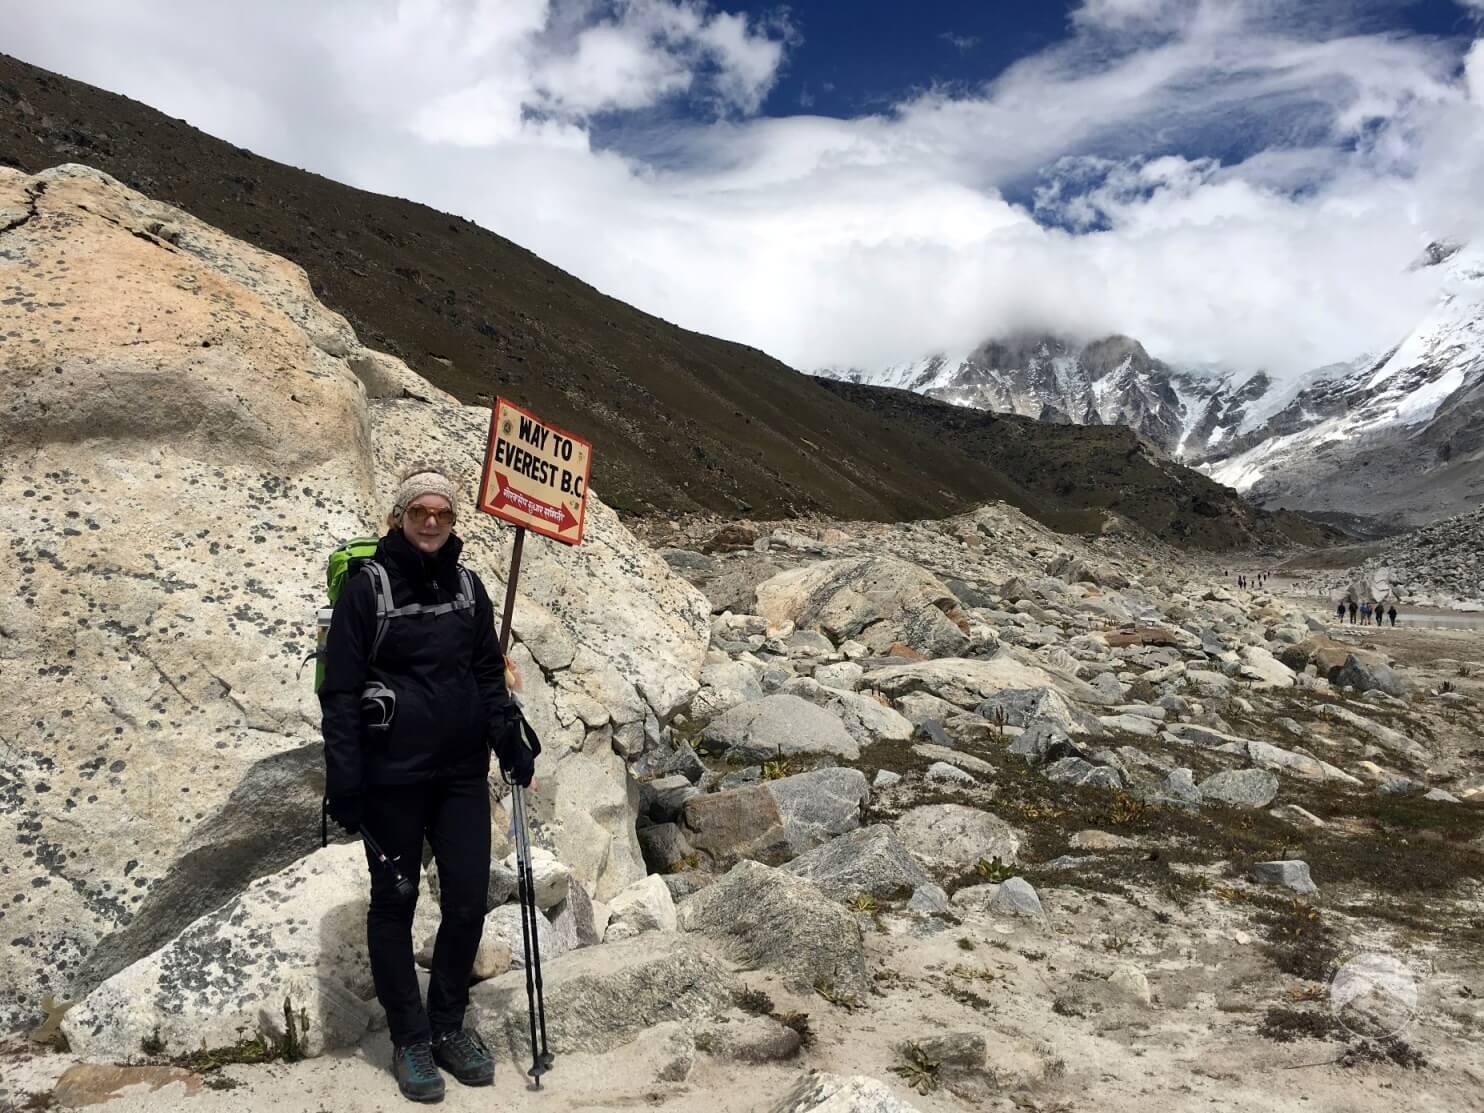 Path to Everest Base Camp at Gorak Shep, Nepal